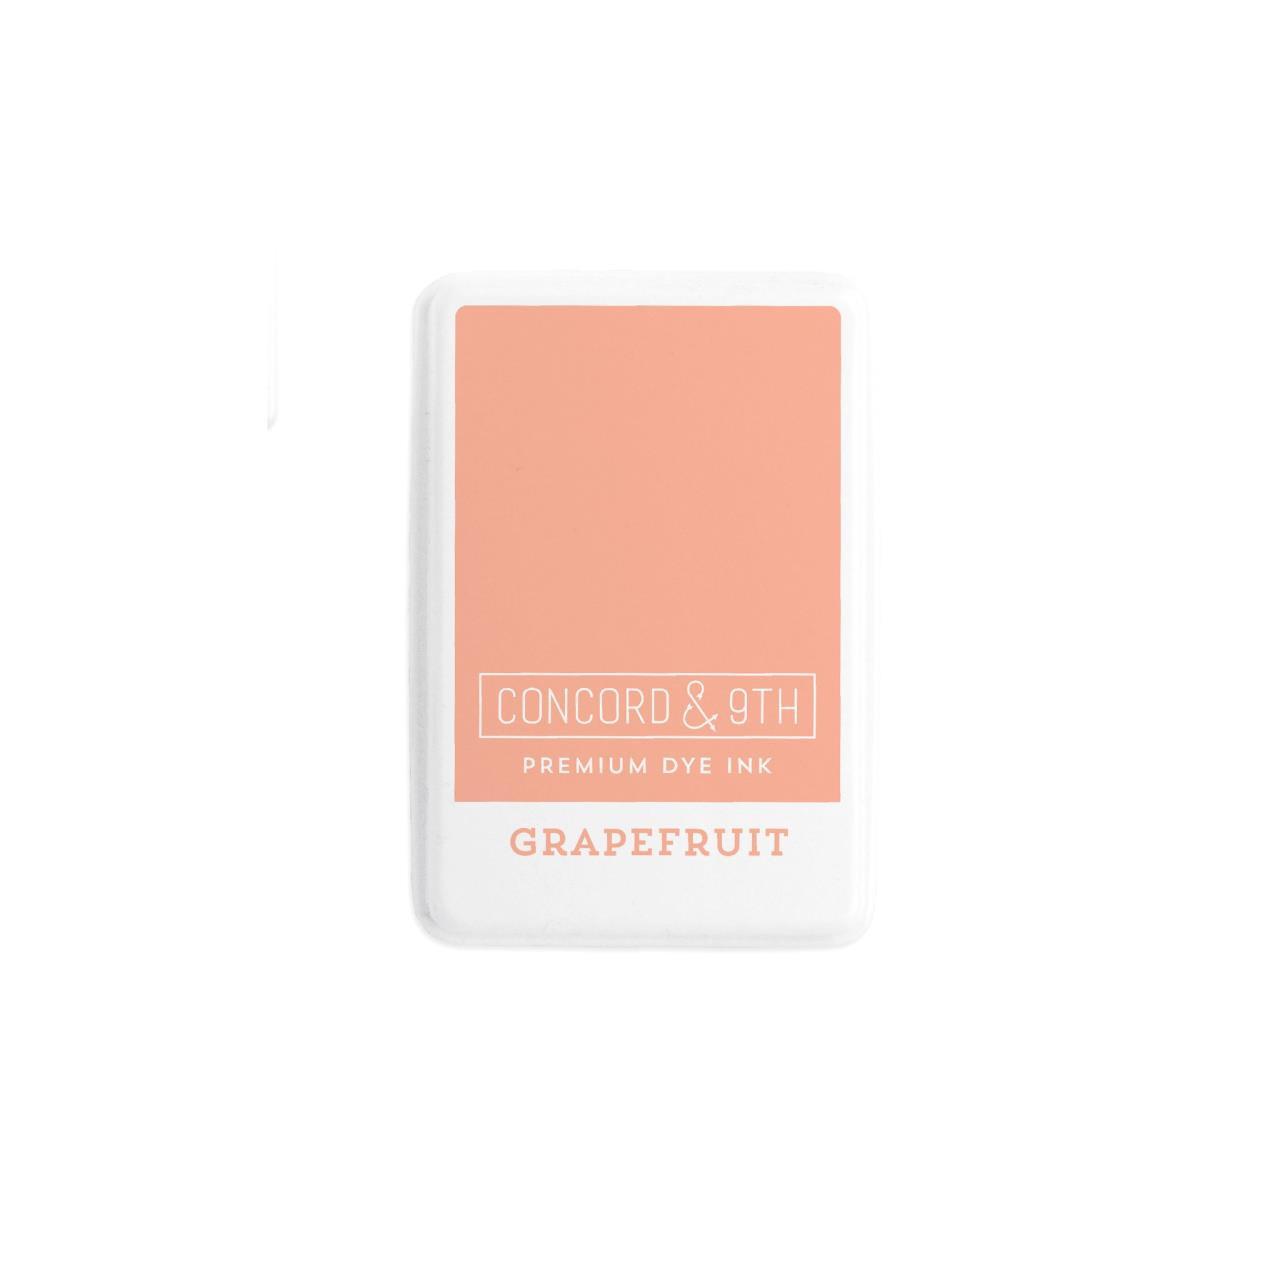 Grapefruit, Concord & 9th Premium Dye Ink Pads - 090222401945